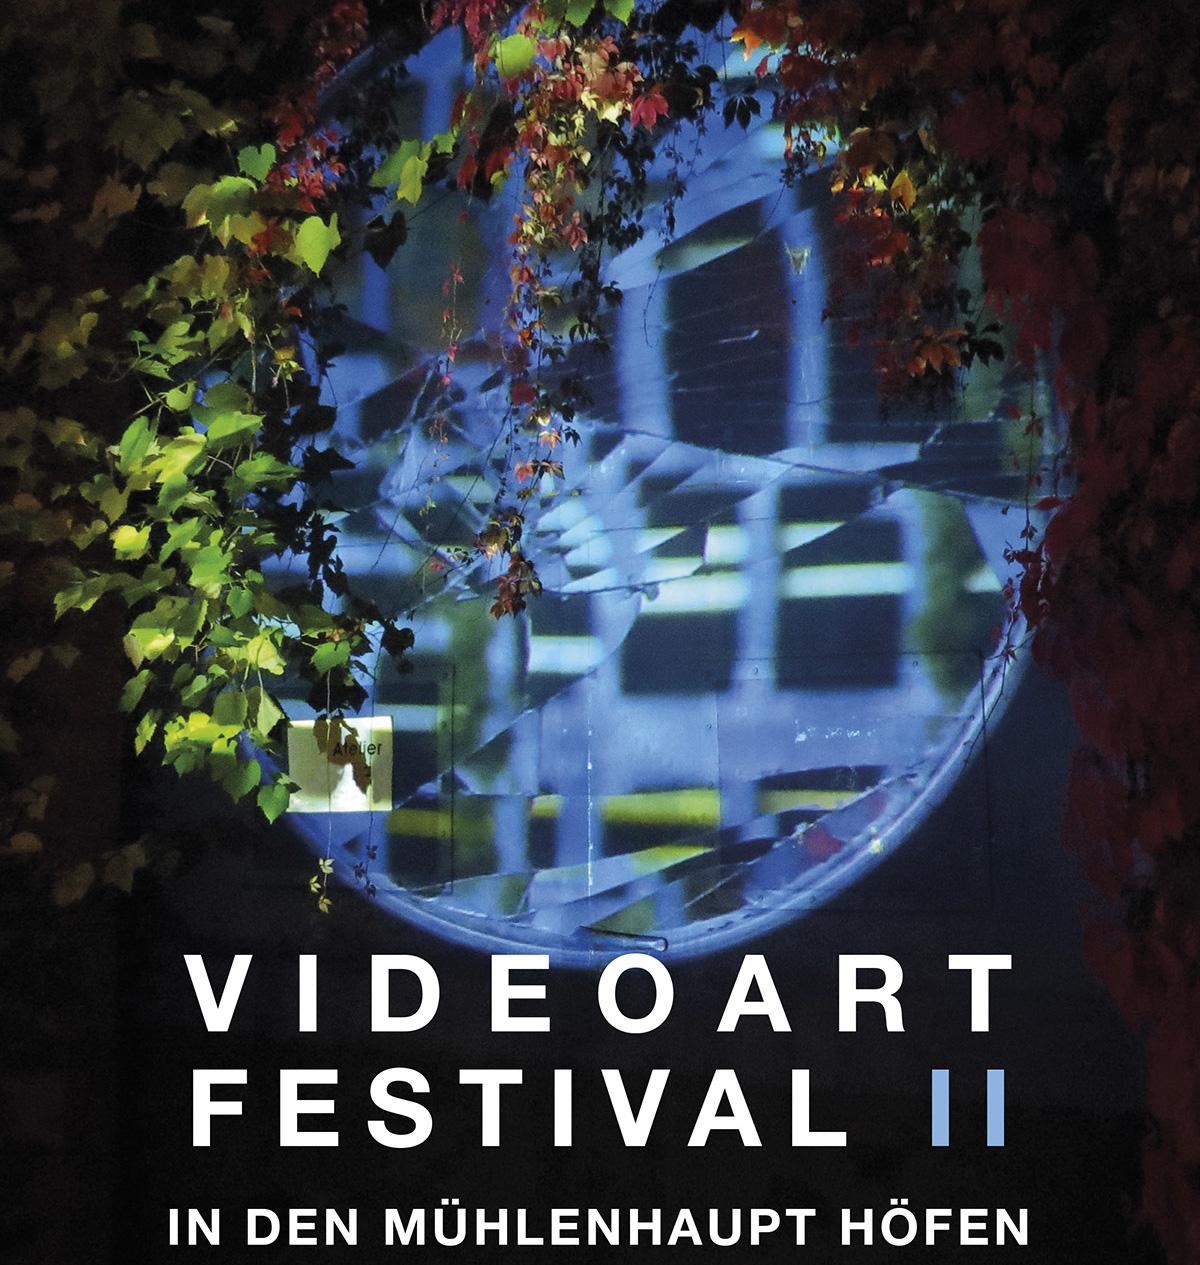 VideoArtFestival II in den Mühlenhaupthöfen 2018